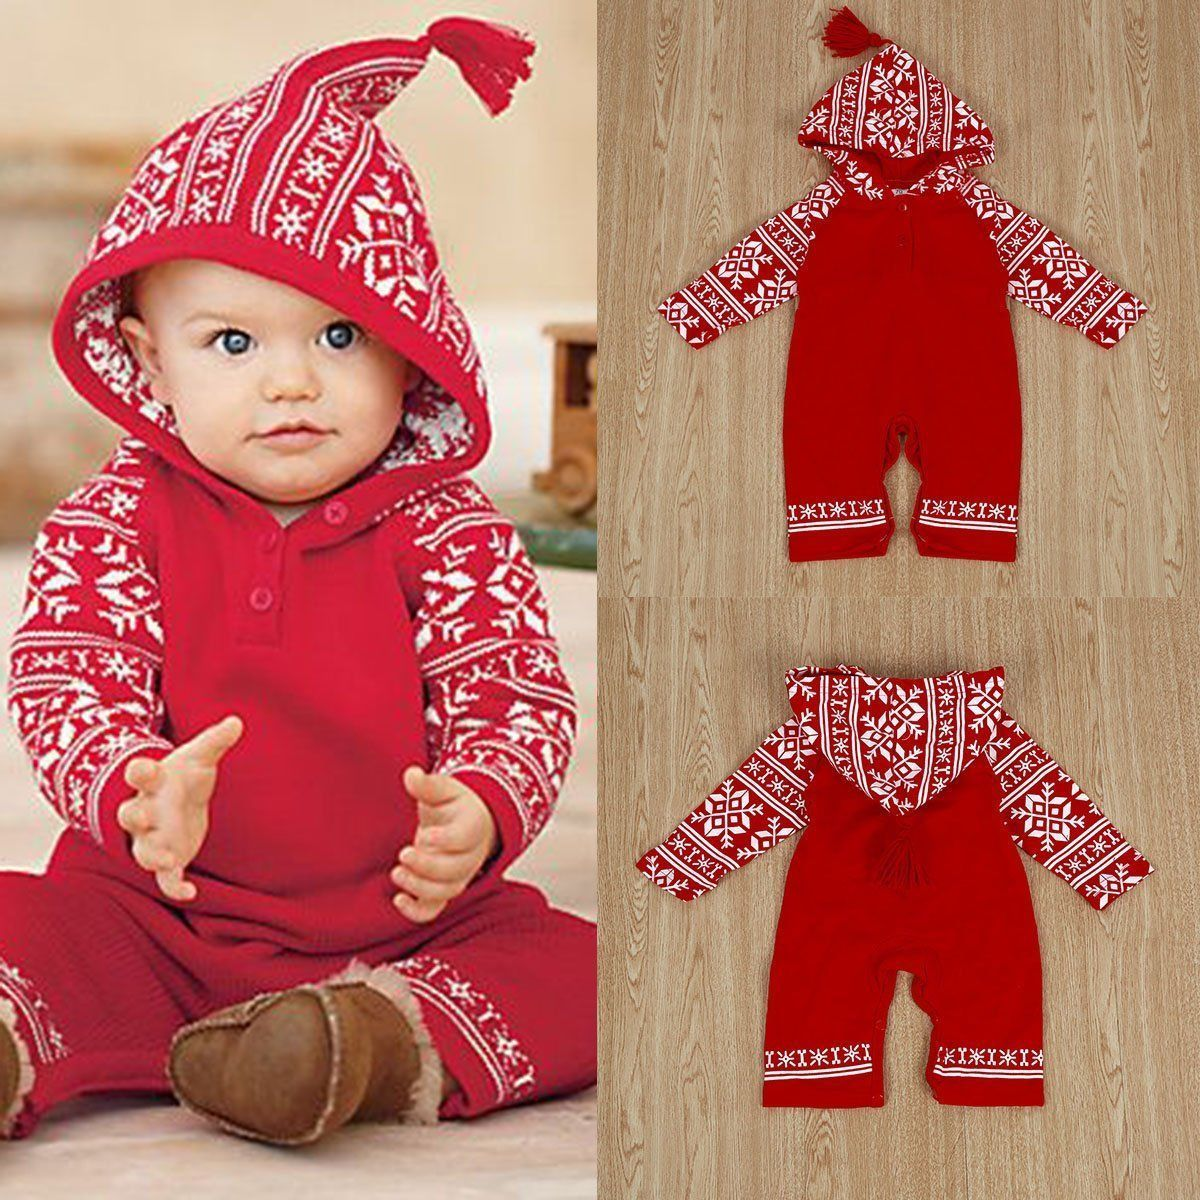 eca0d3ace6d  3.89 - Baby Girls Hoodie Rompers Jumpsuit Bodysuit Snowflake Cotton Soft  Outfit Clothes  ebay